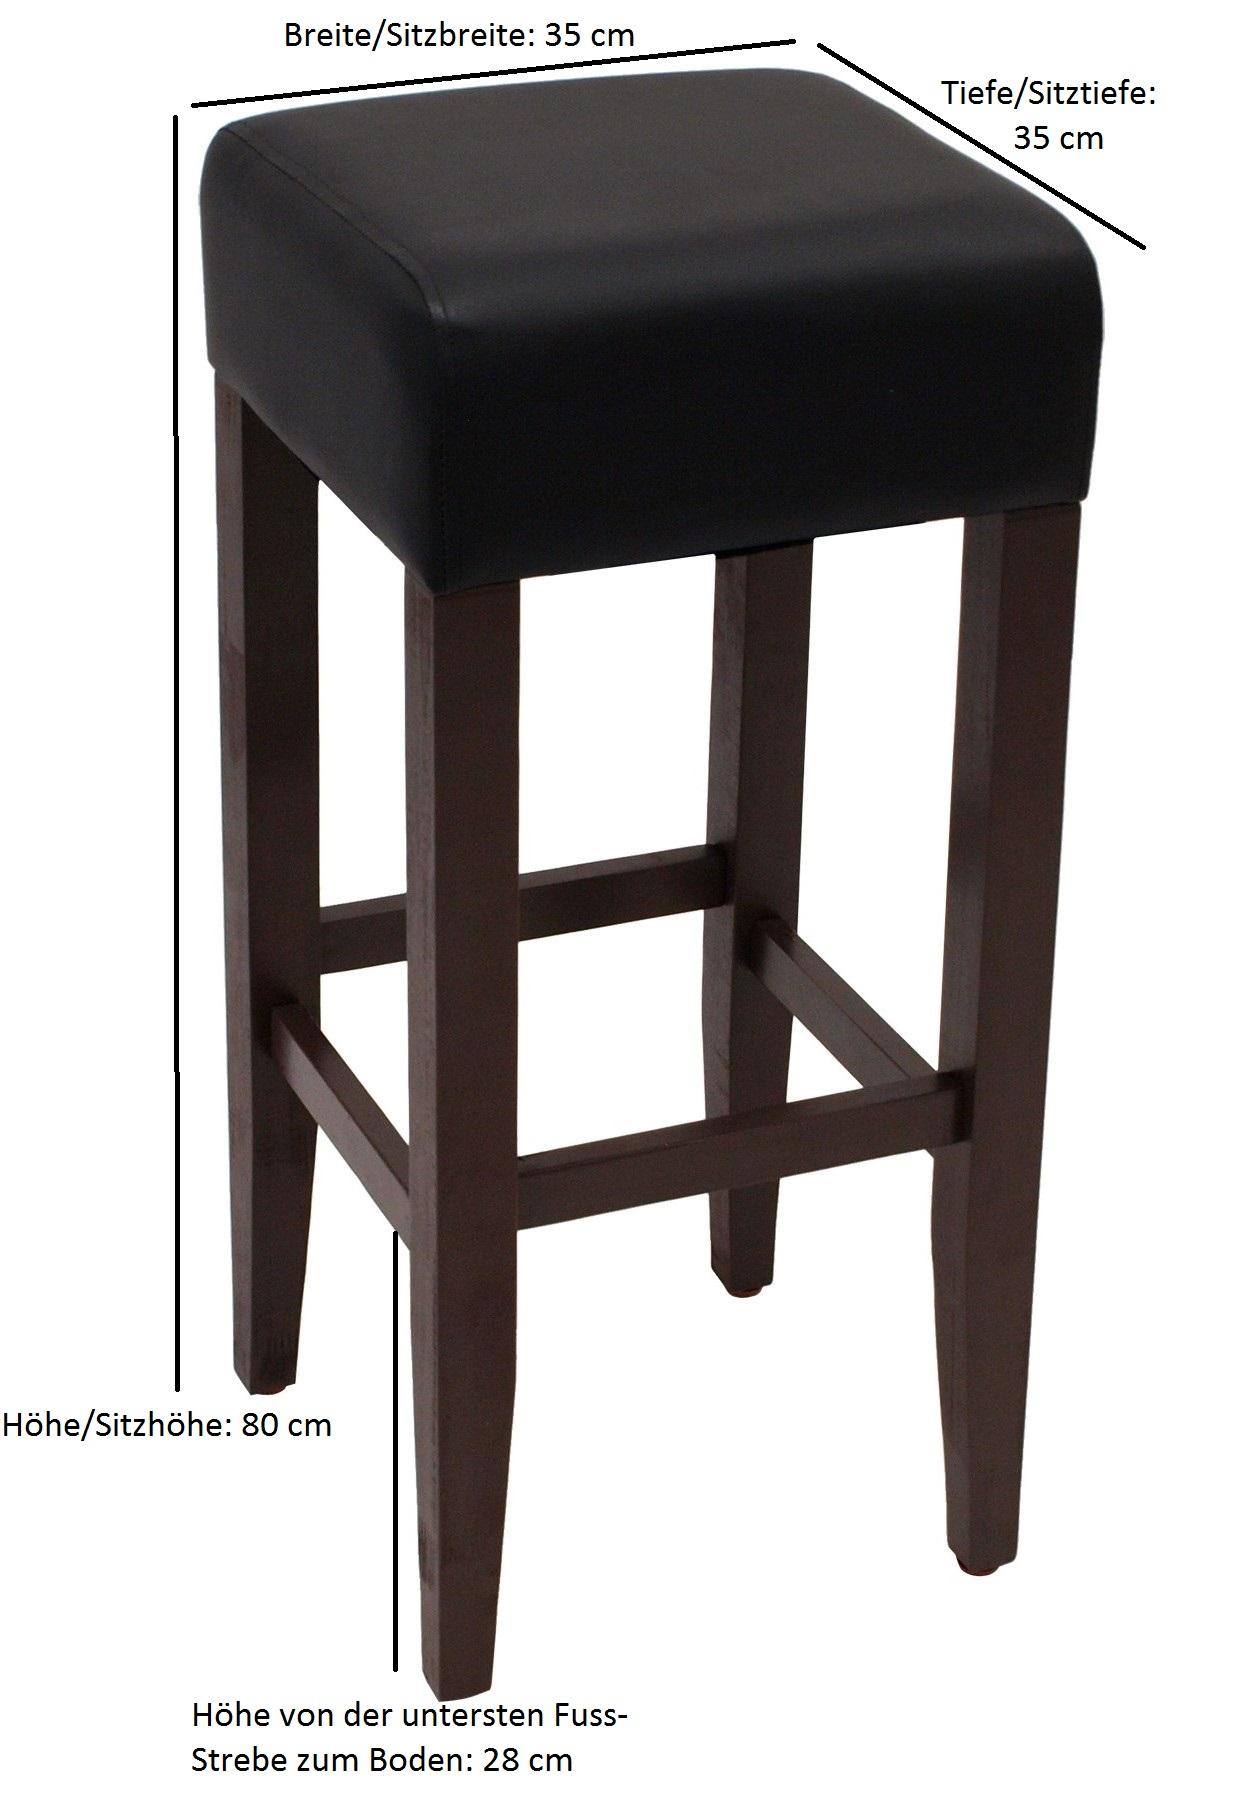 Barhocker BODEGA, Gestell Akazienholz braun, Sitz Kunstleder schwarz, 2 Stück, FSC®-zertifiziert